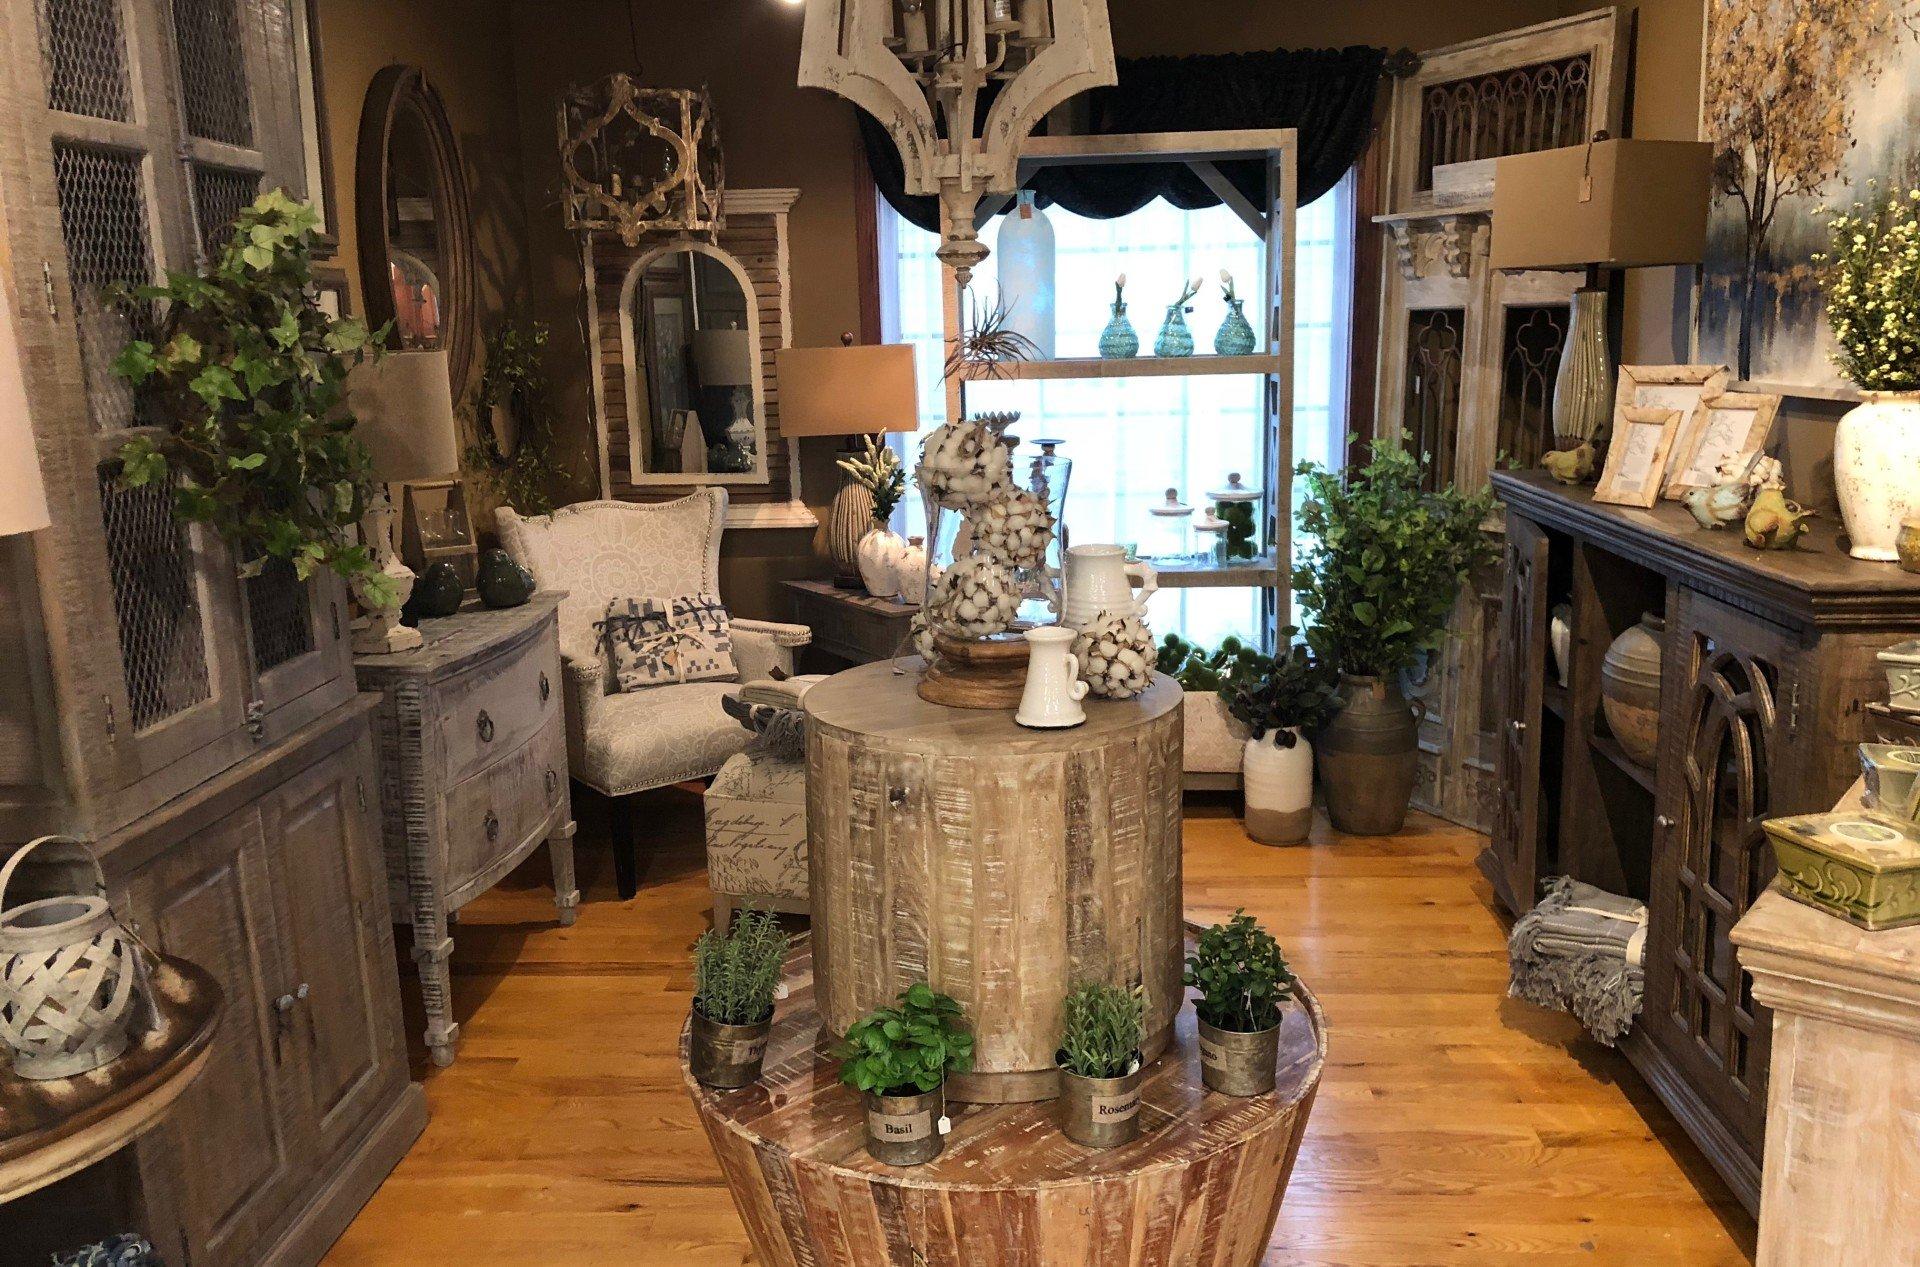 Homestead Decor Gift Shop Green Bay Wi